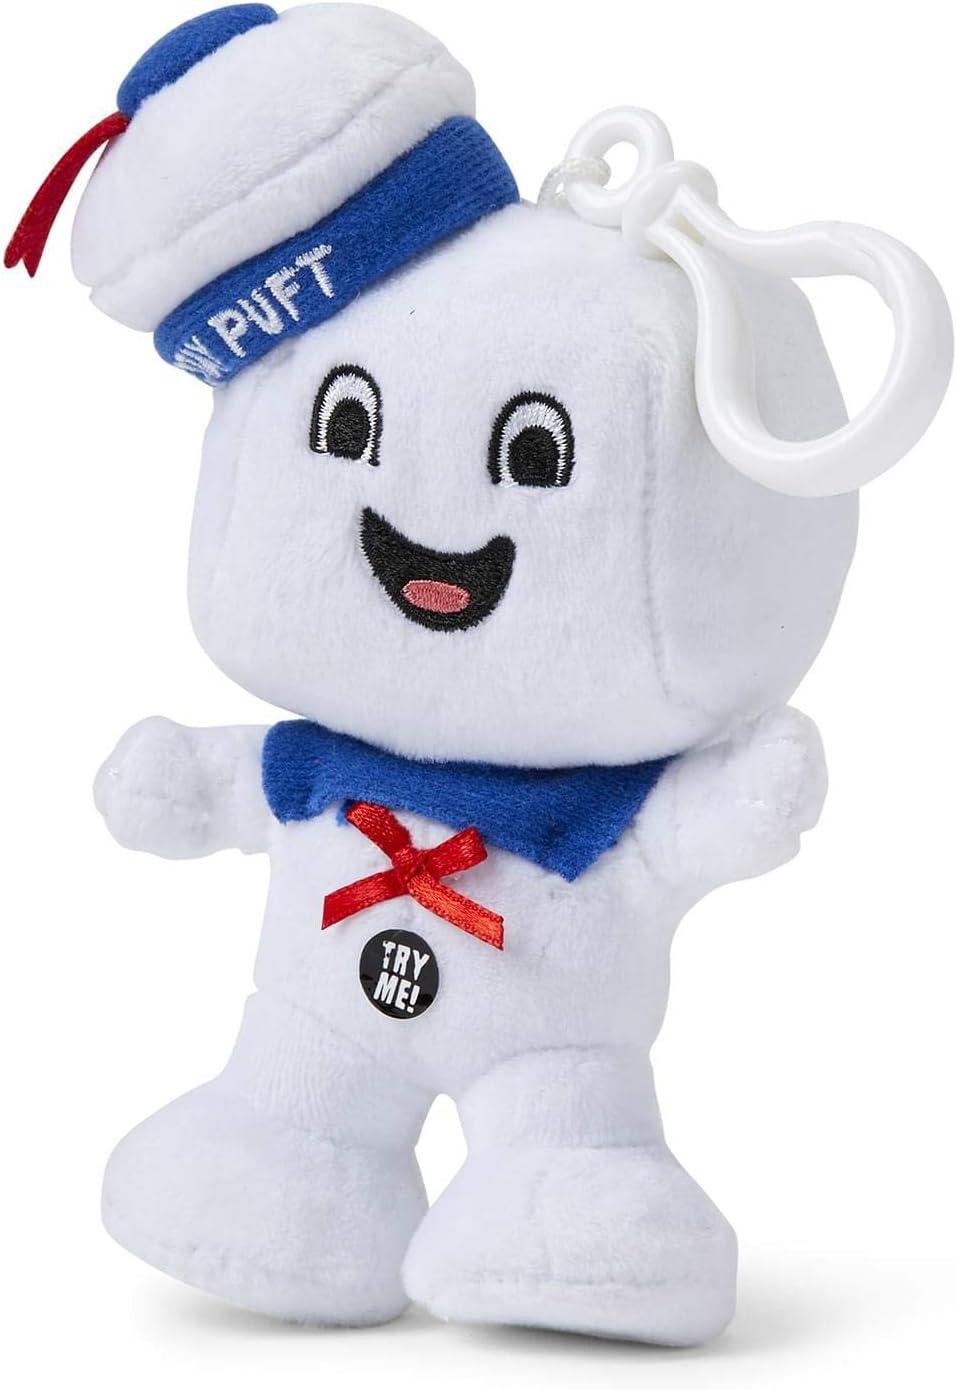 Peluche Ghostbusters Stay Puft Marshmallow Man Fabrikations 16 cm Plush Funko